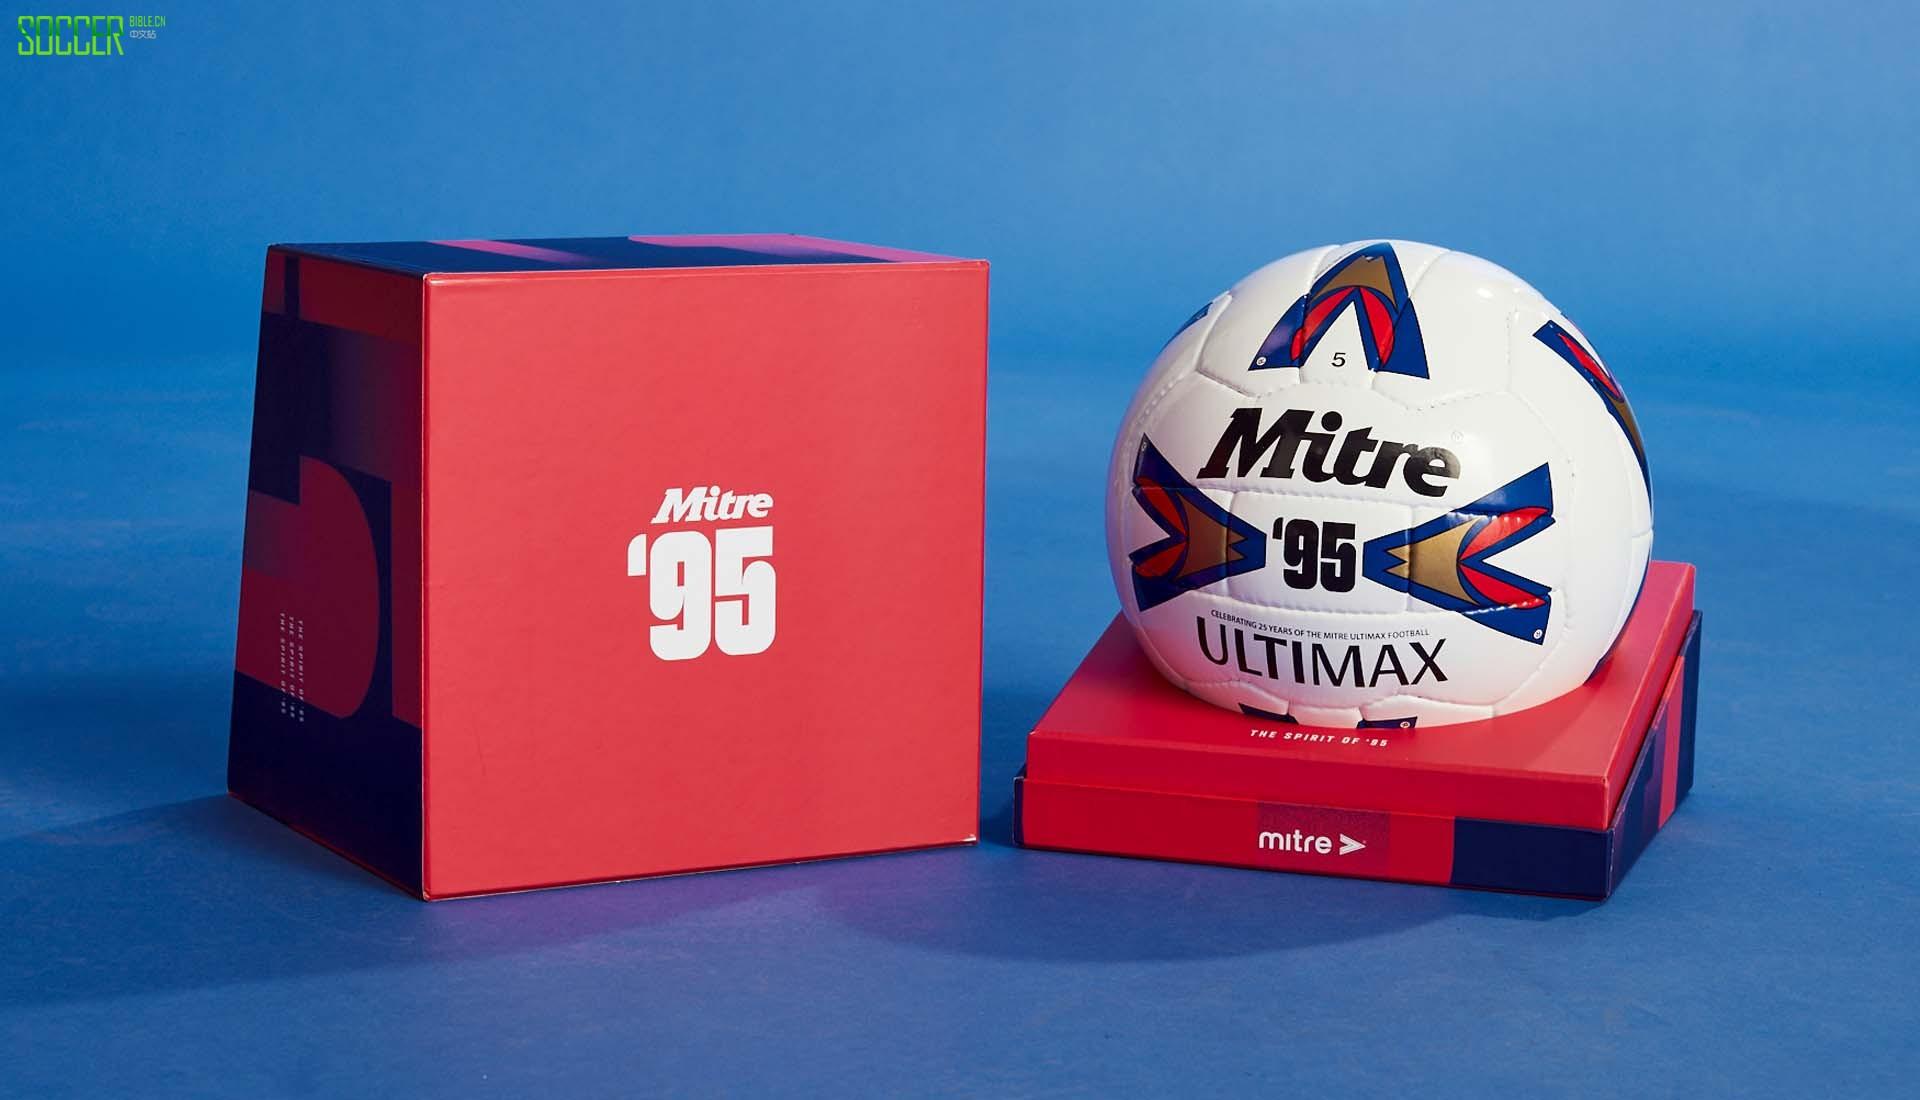 Mitre再次发布经典的Ultimax